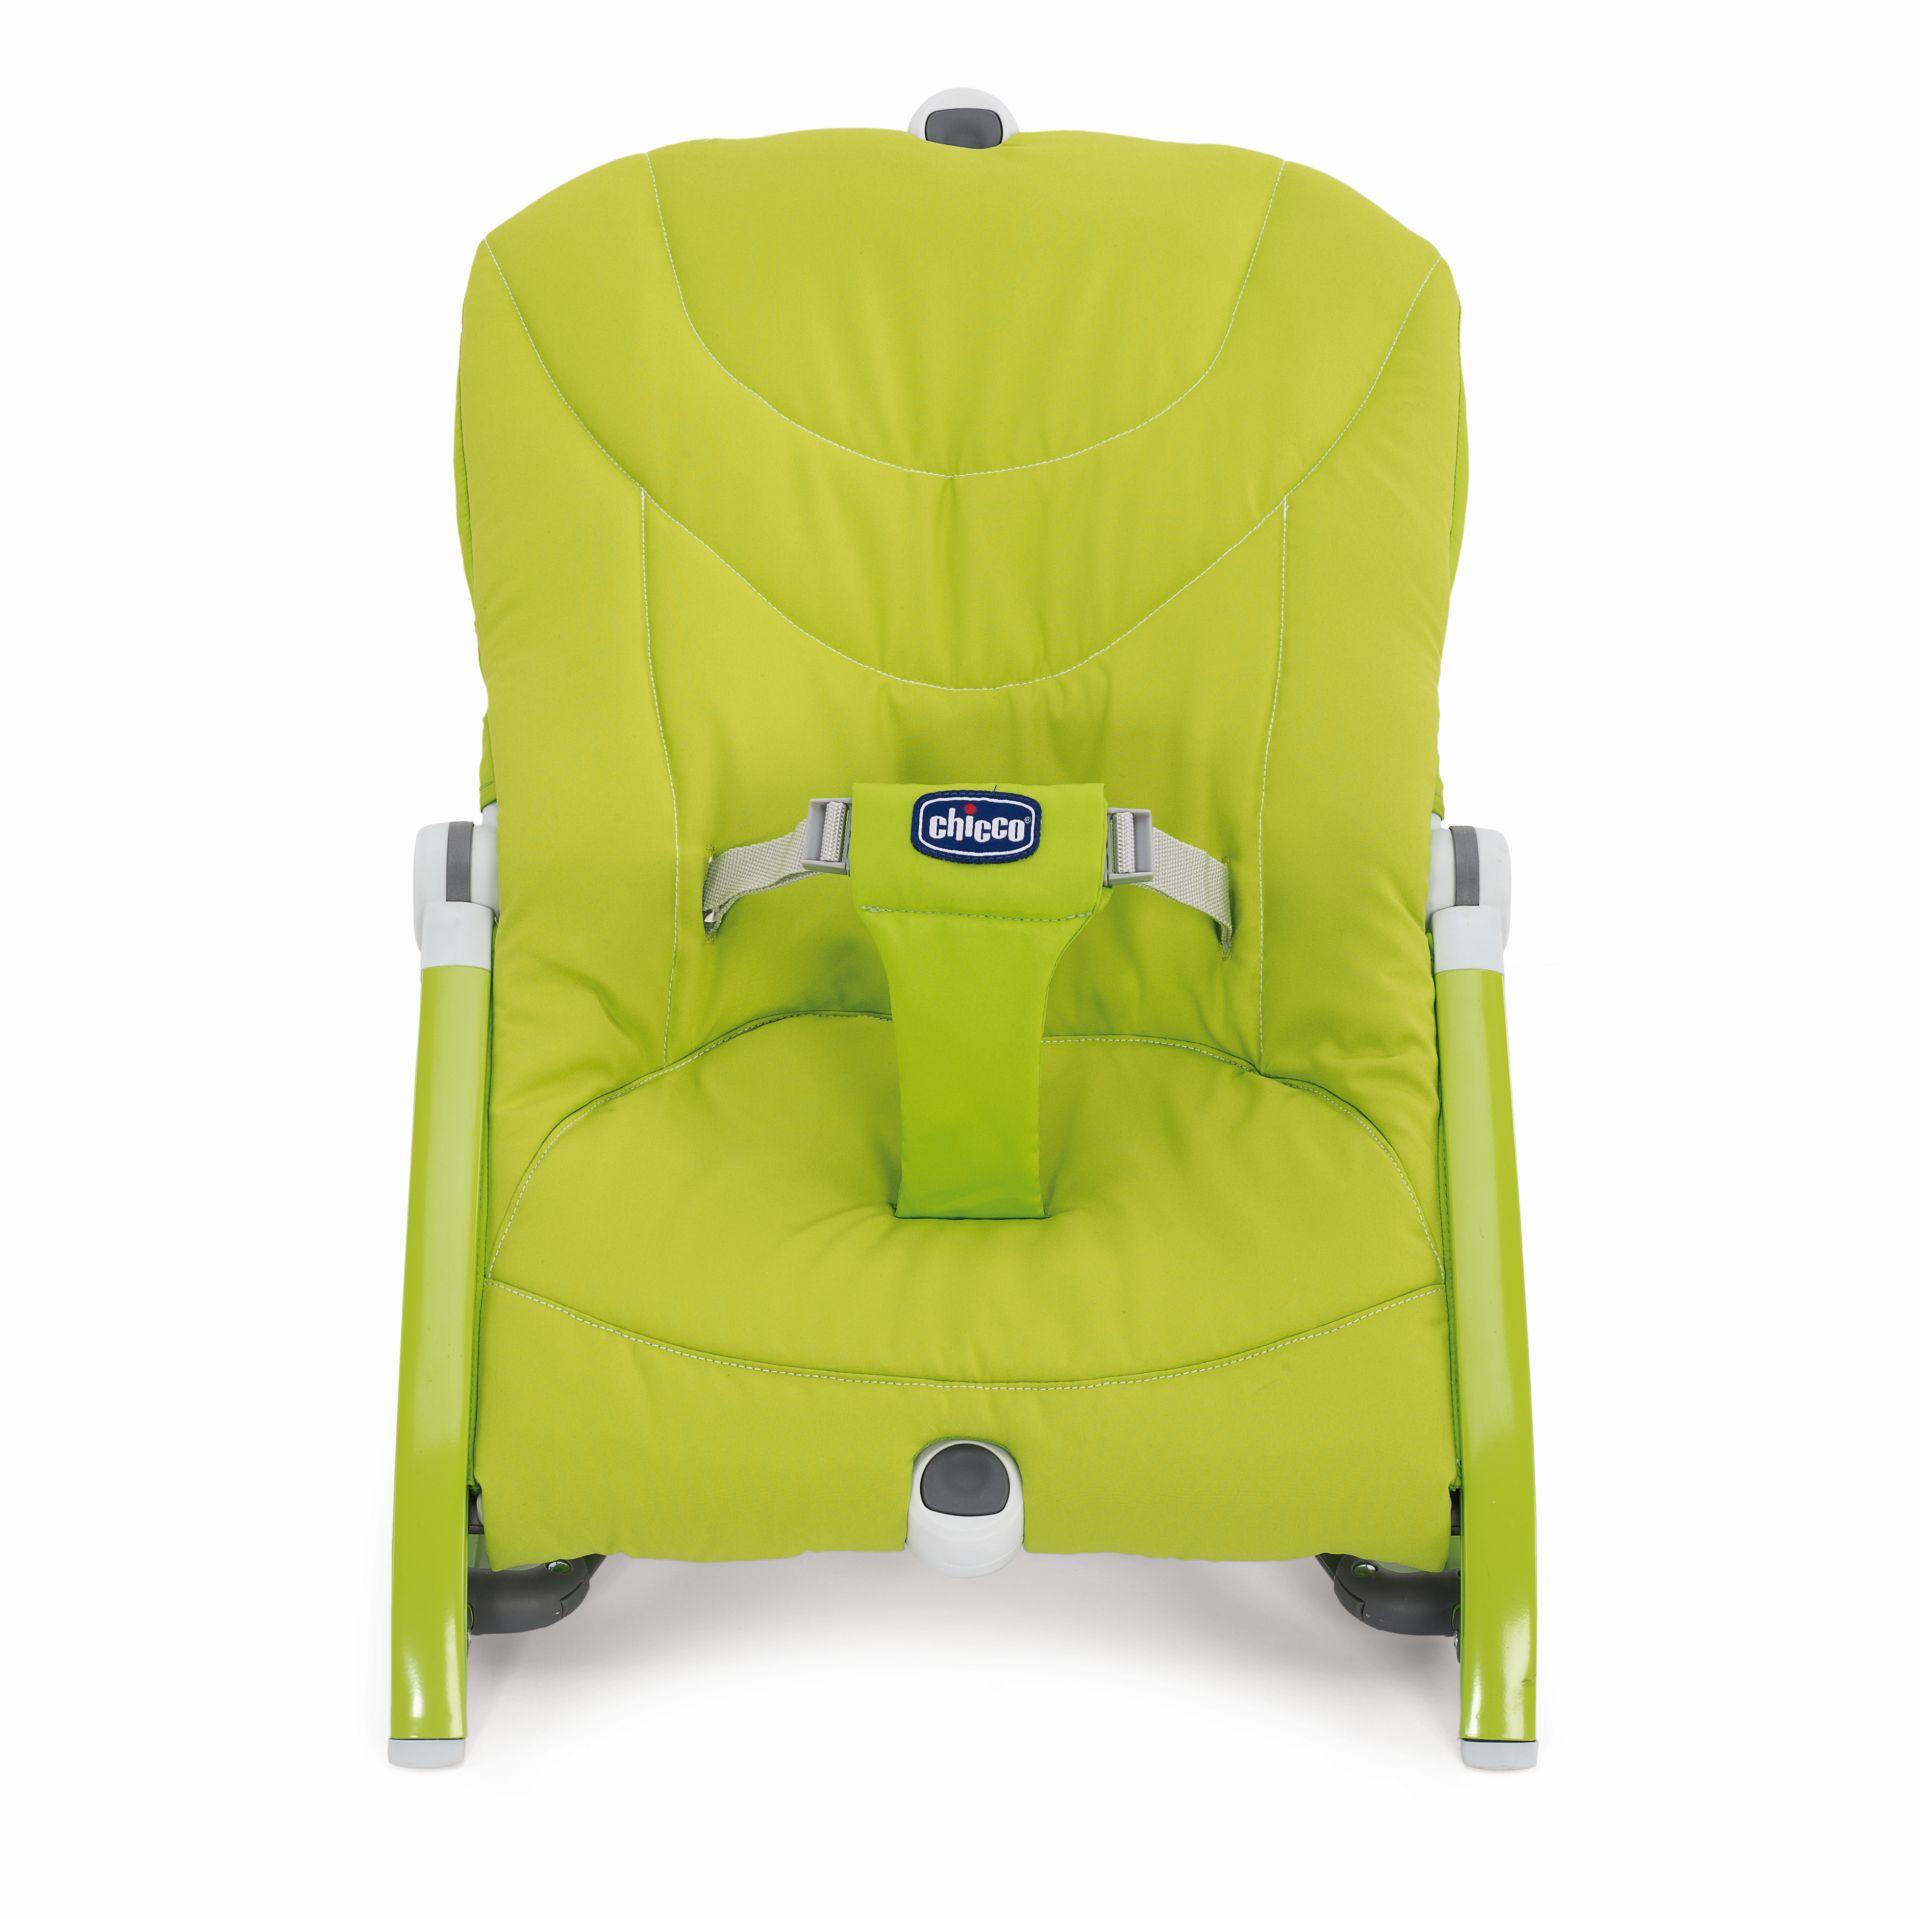 Hamaca Pocket Relax Chicco 2018 GREEN  Comprar en